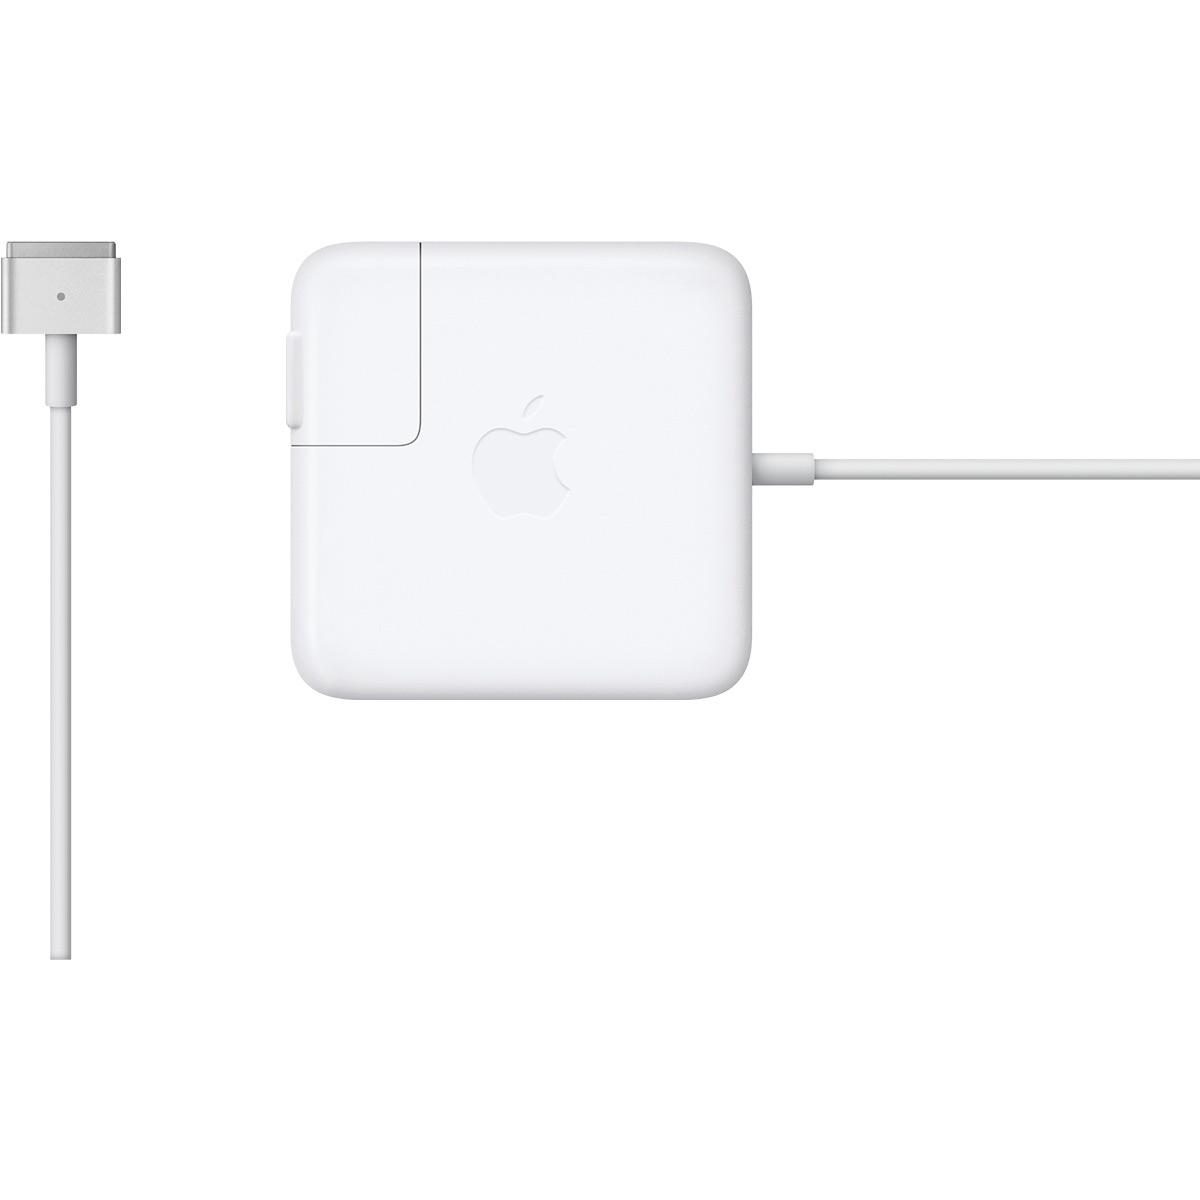 for MacBook Pro with Retina display